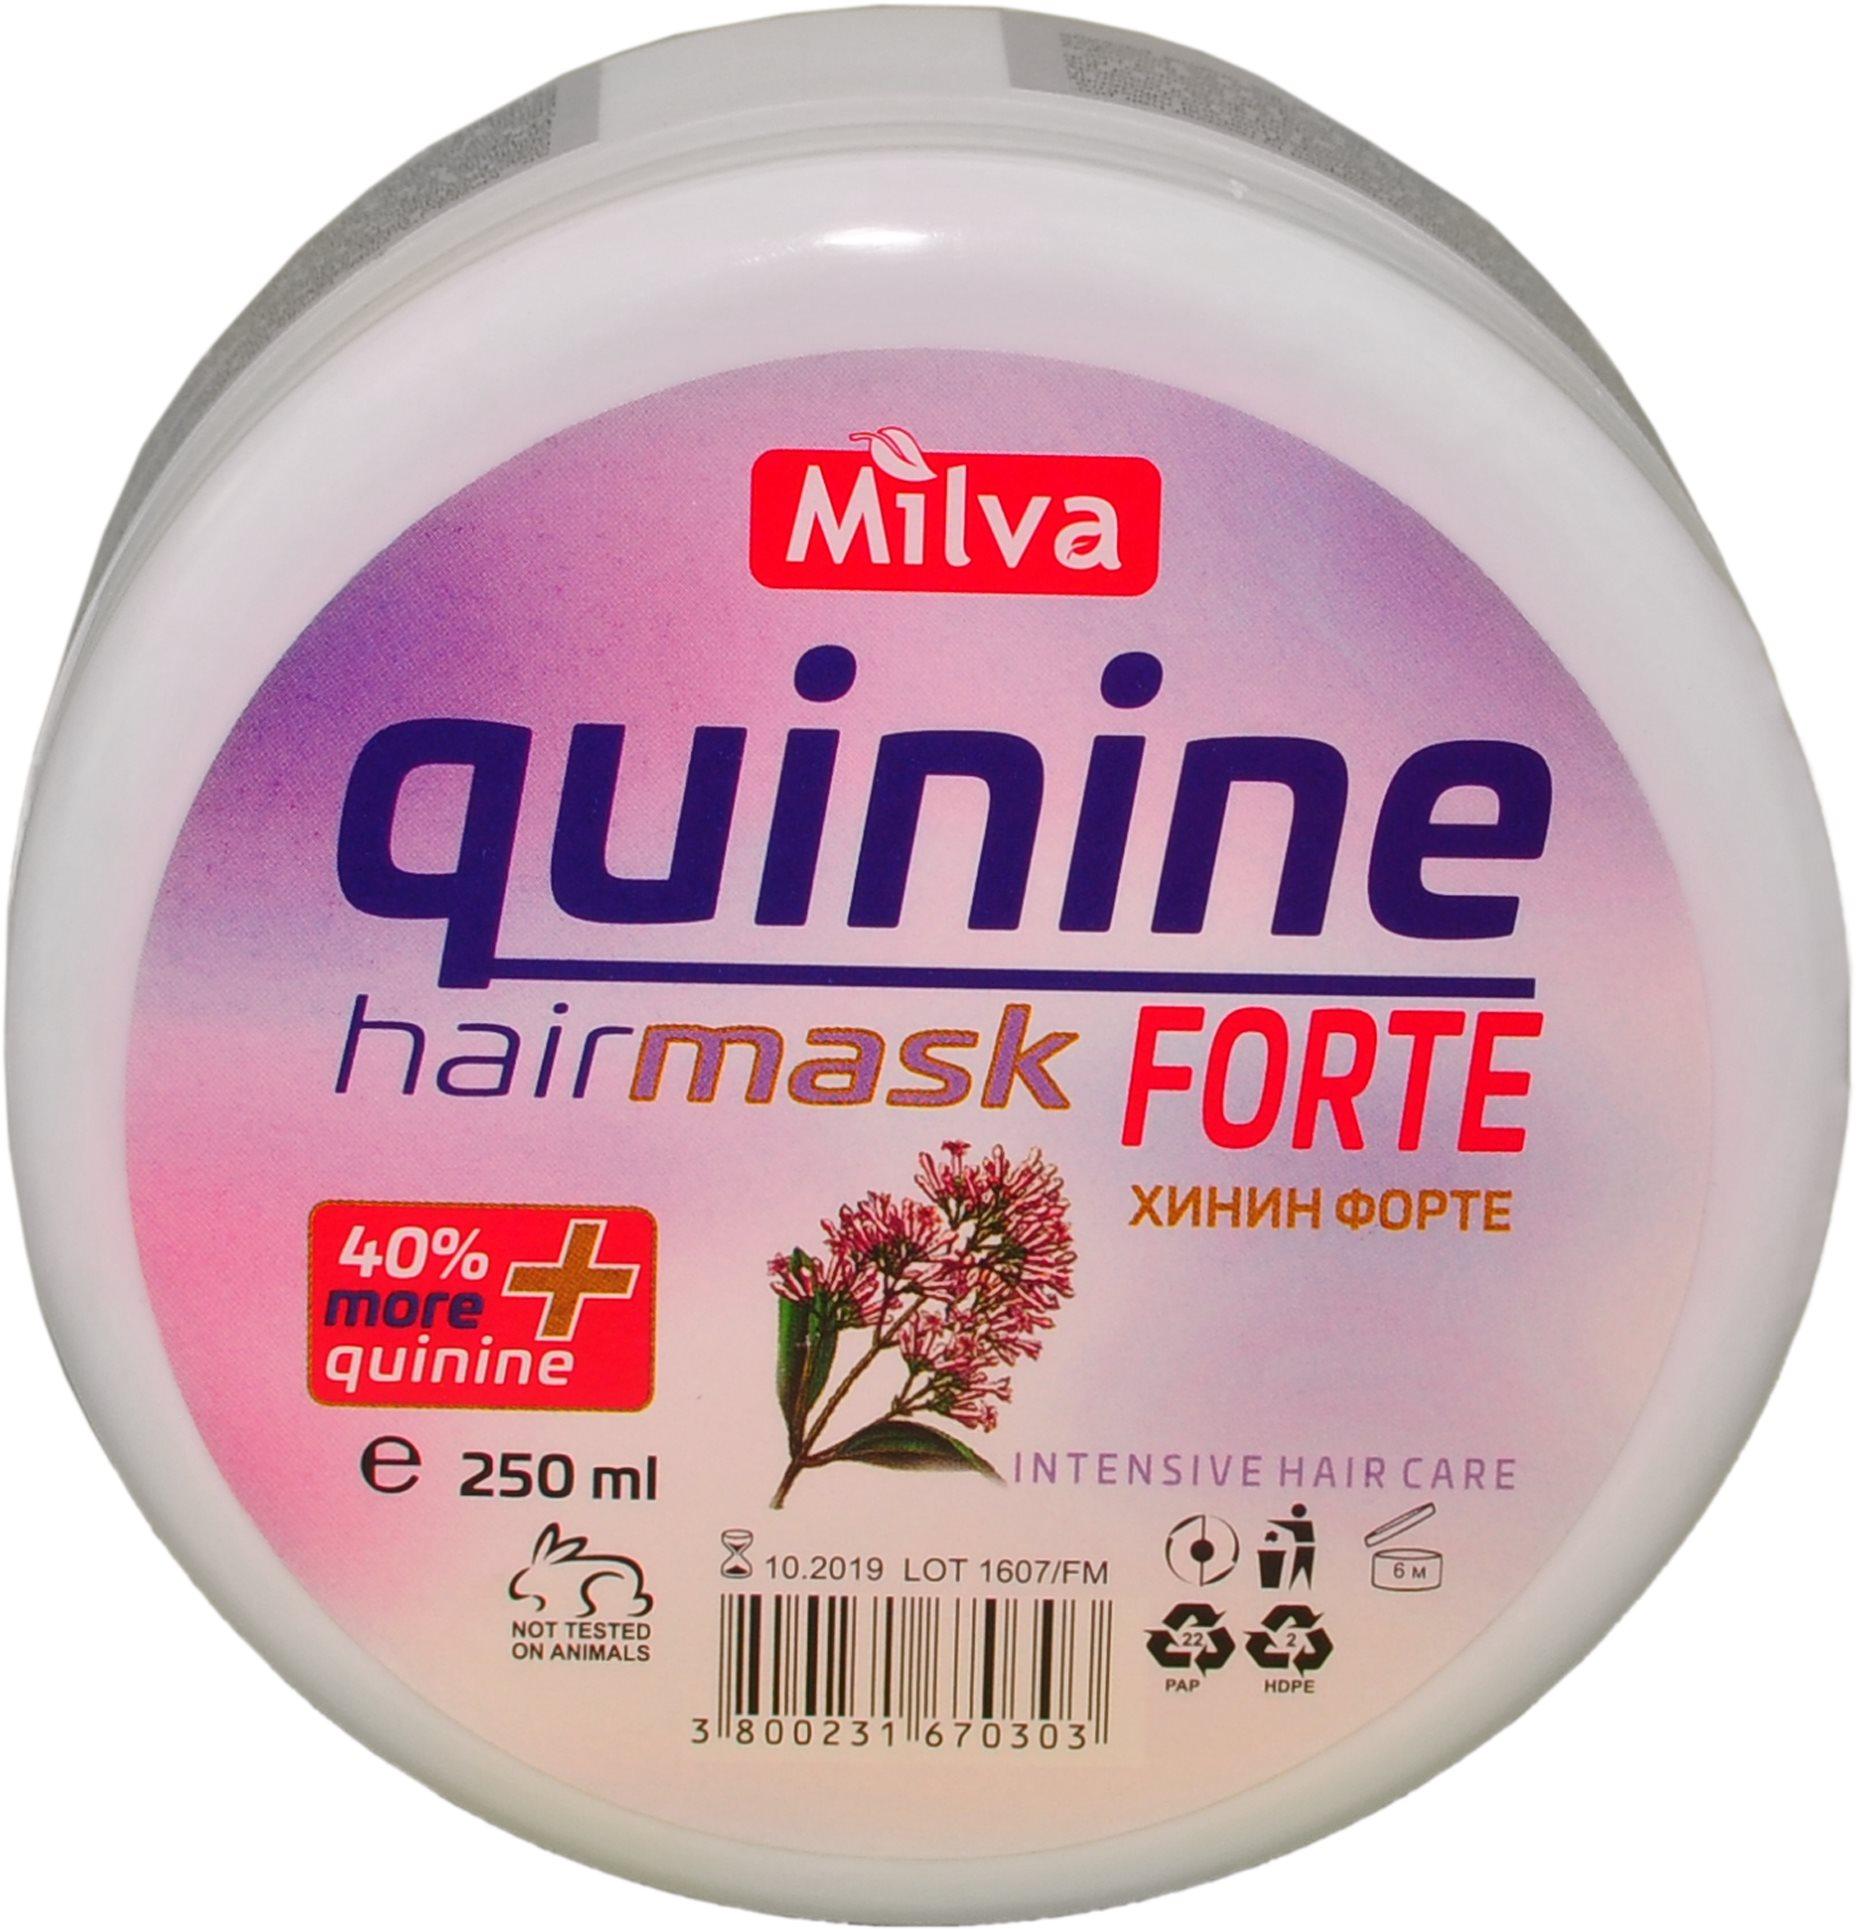 MILVA Kinin maszk Forte 250 ml